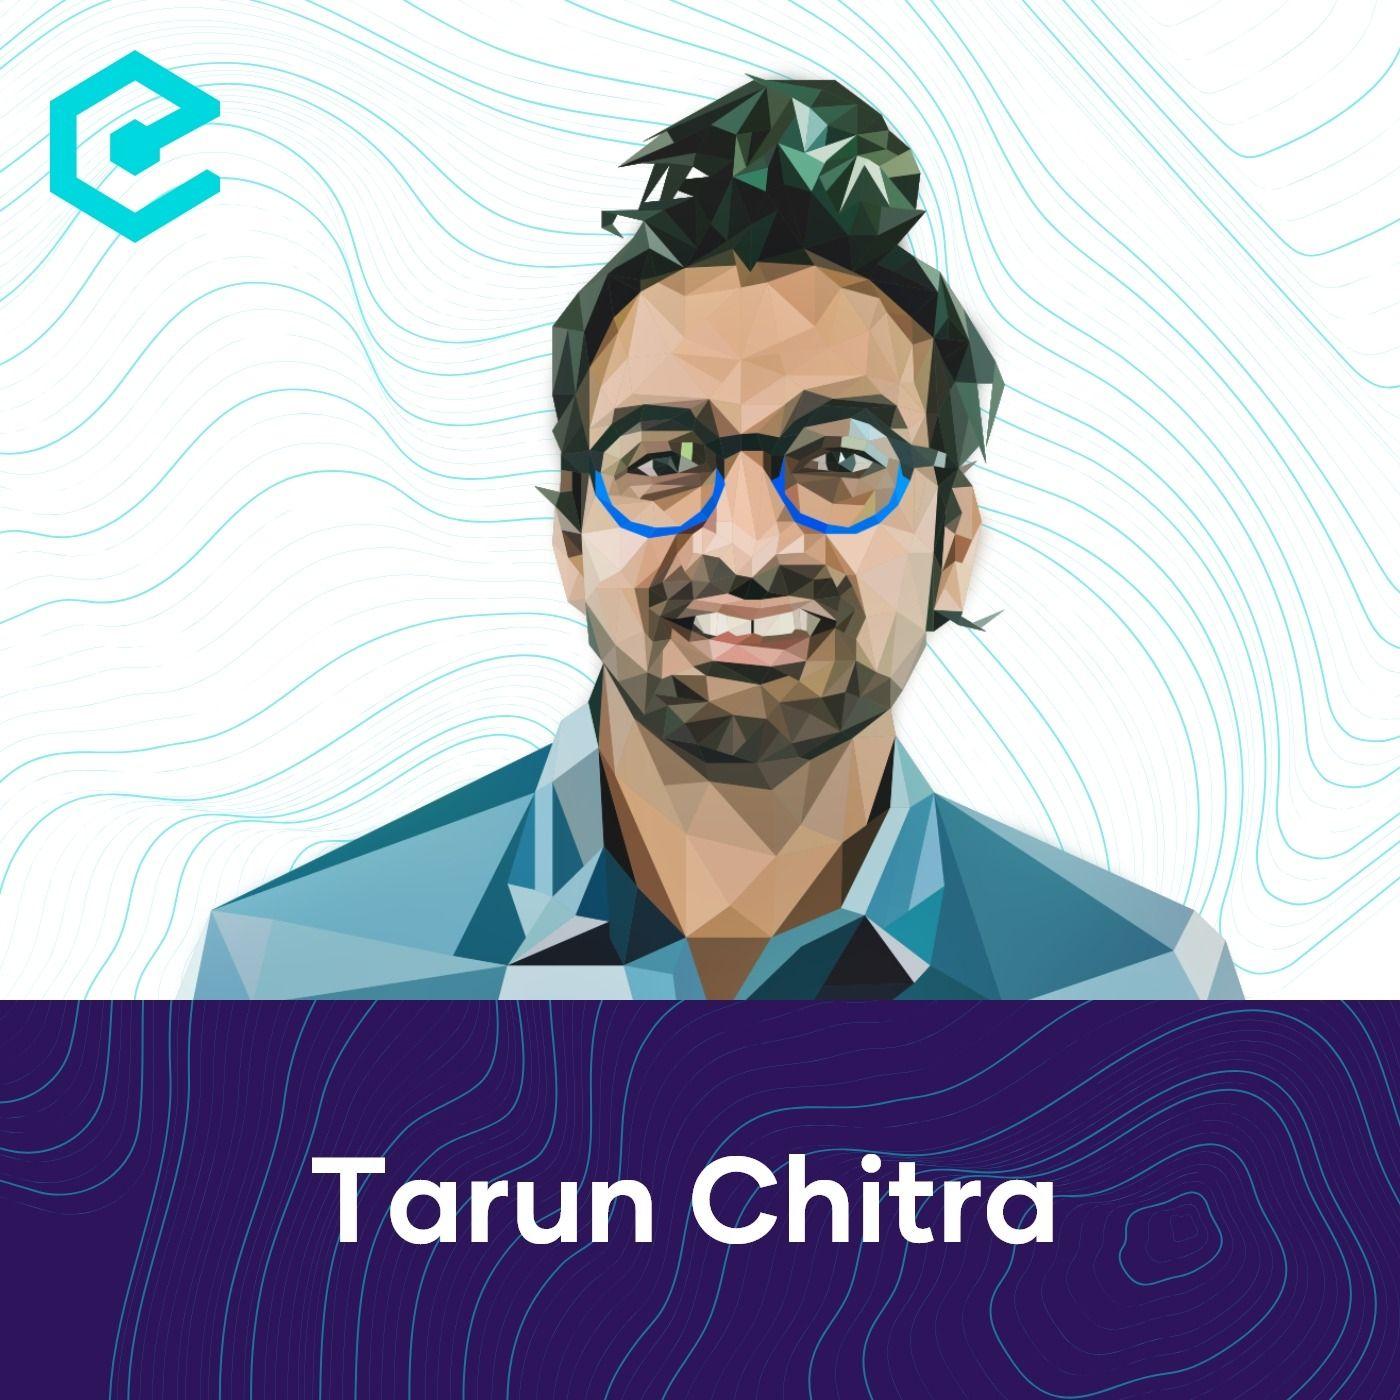 Tarun Chitra: Gauntlet – The Simulation Platform for Blockchain Protocols